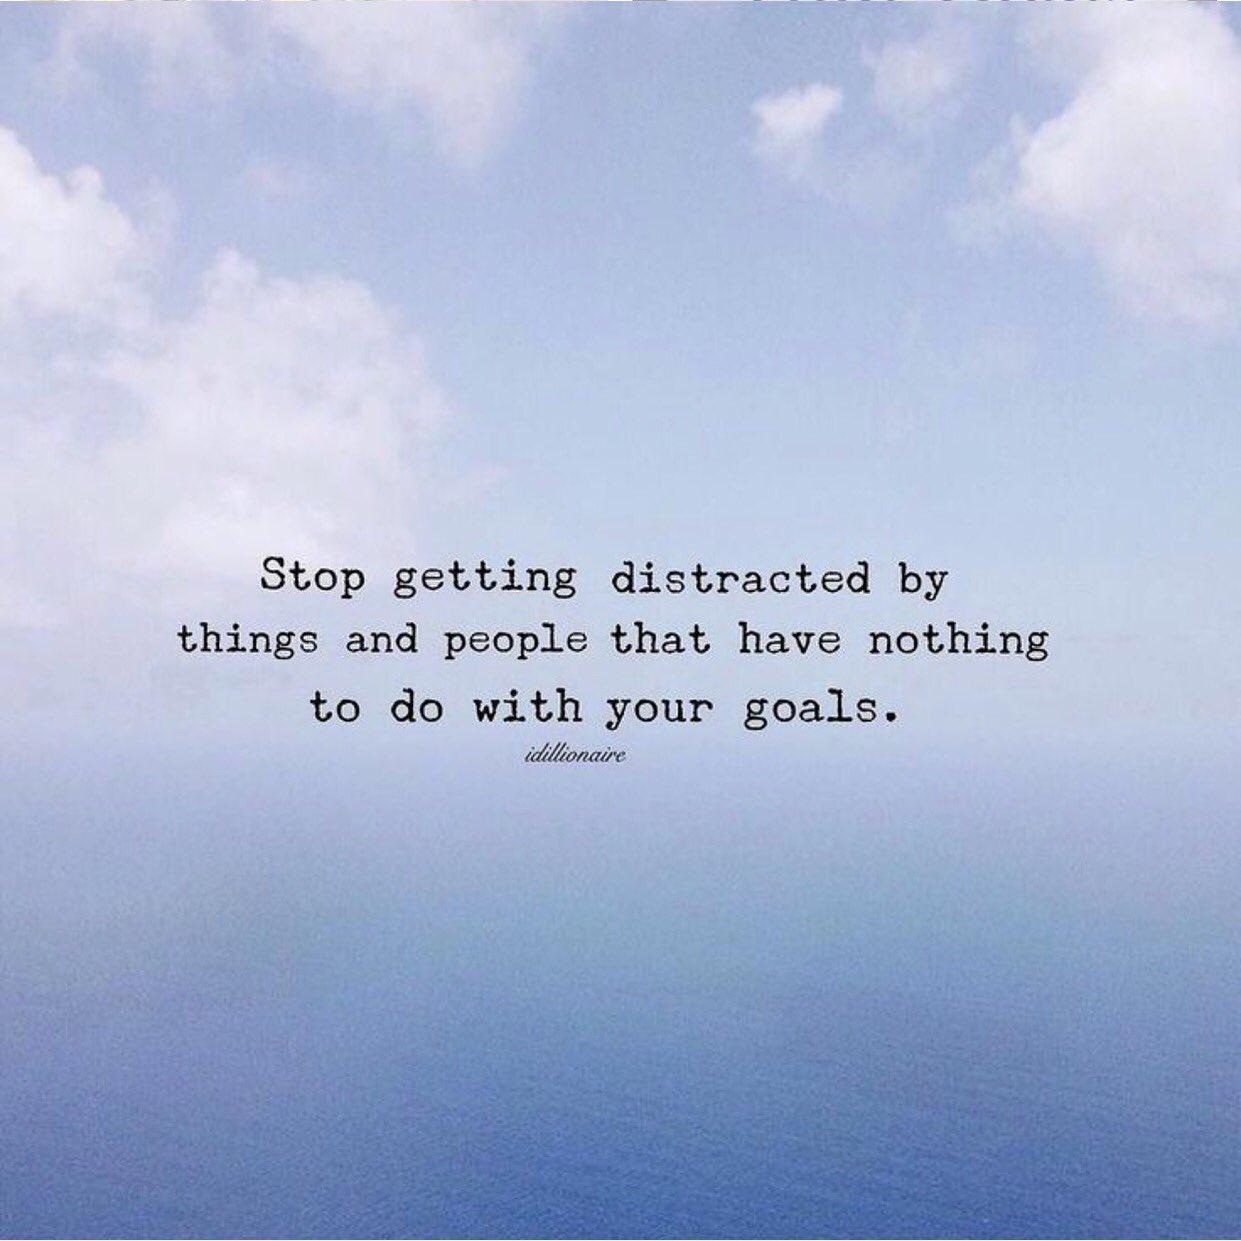 Goals @thebestmelife https://t.co/tpLrckpddd